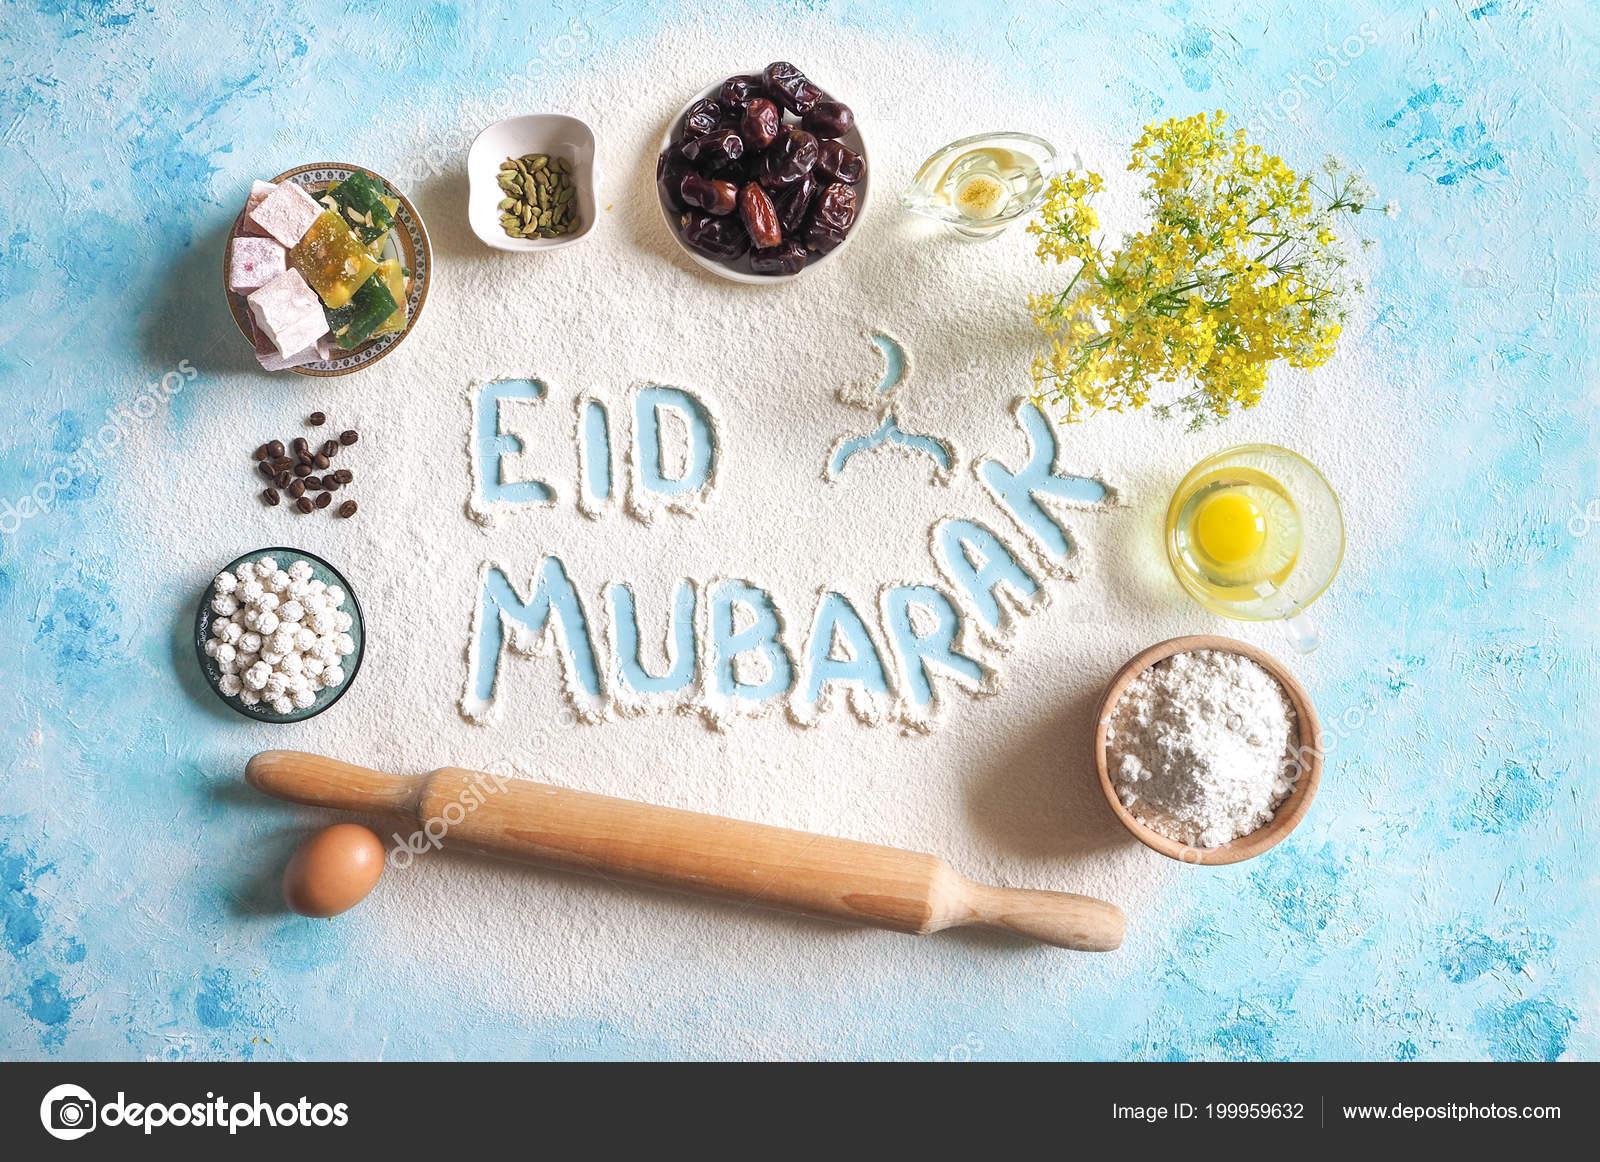 Eid mubarak islamic holiday welcome phrase happy holiday eid mubarak islamic holiday welcome phrase happy holiday greeting reserved arabic baking background photo by sablinstanislav m4hsunfo